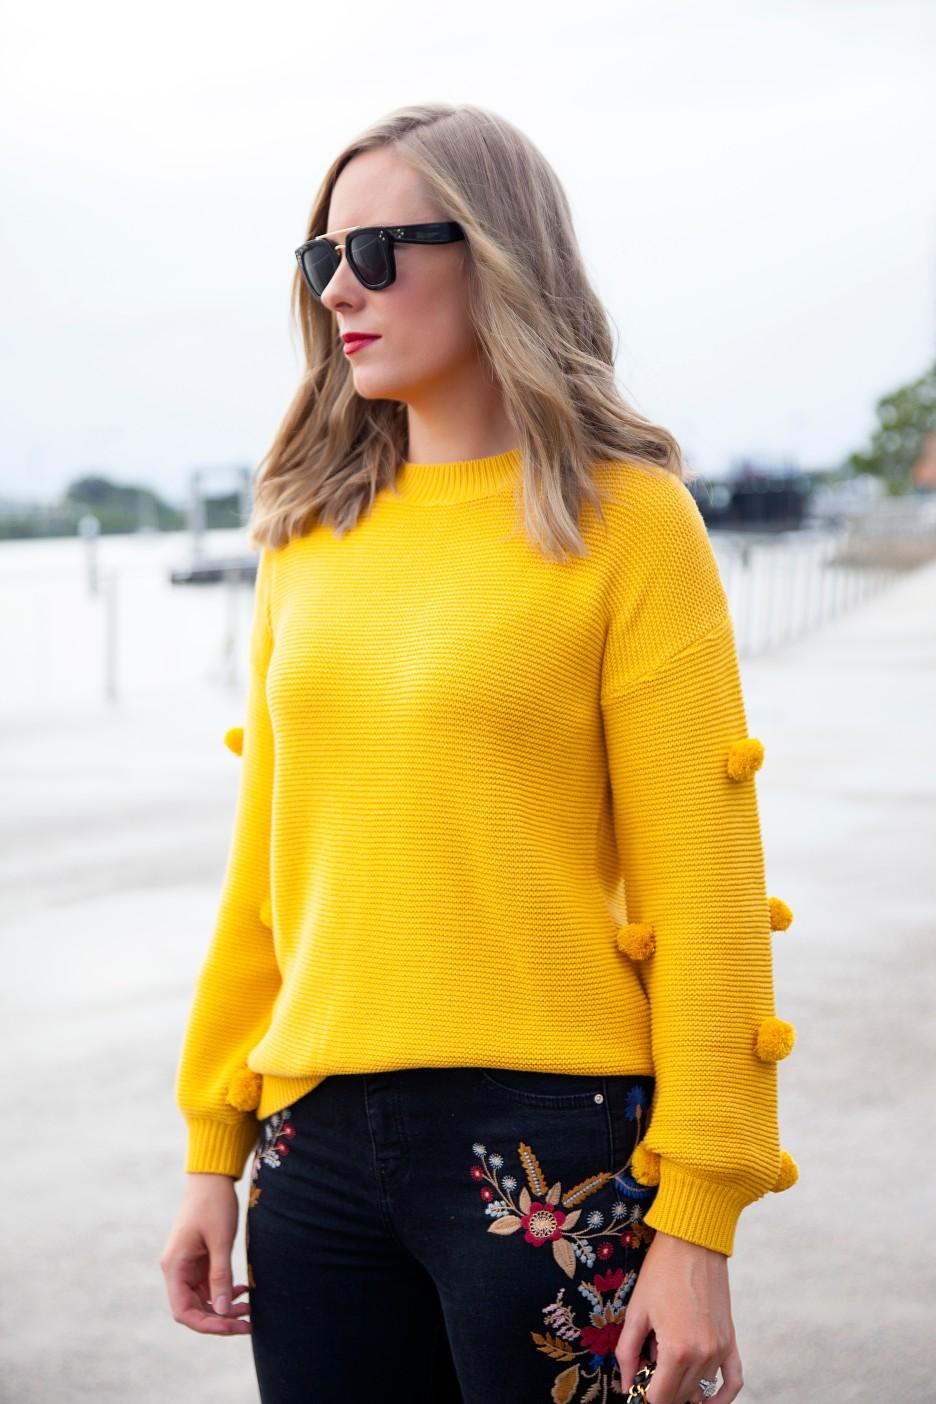 Style Elixir blog Lauren Slade marigold color trend fashion style outfit ideas 4